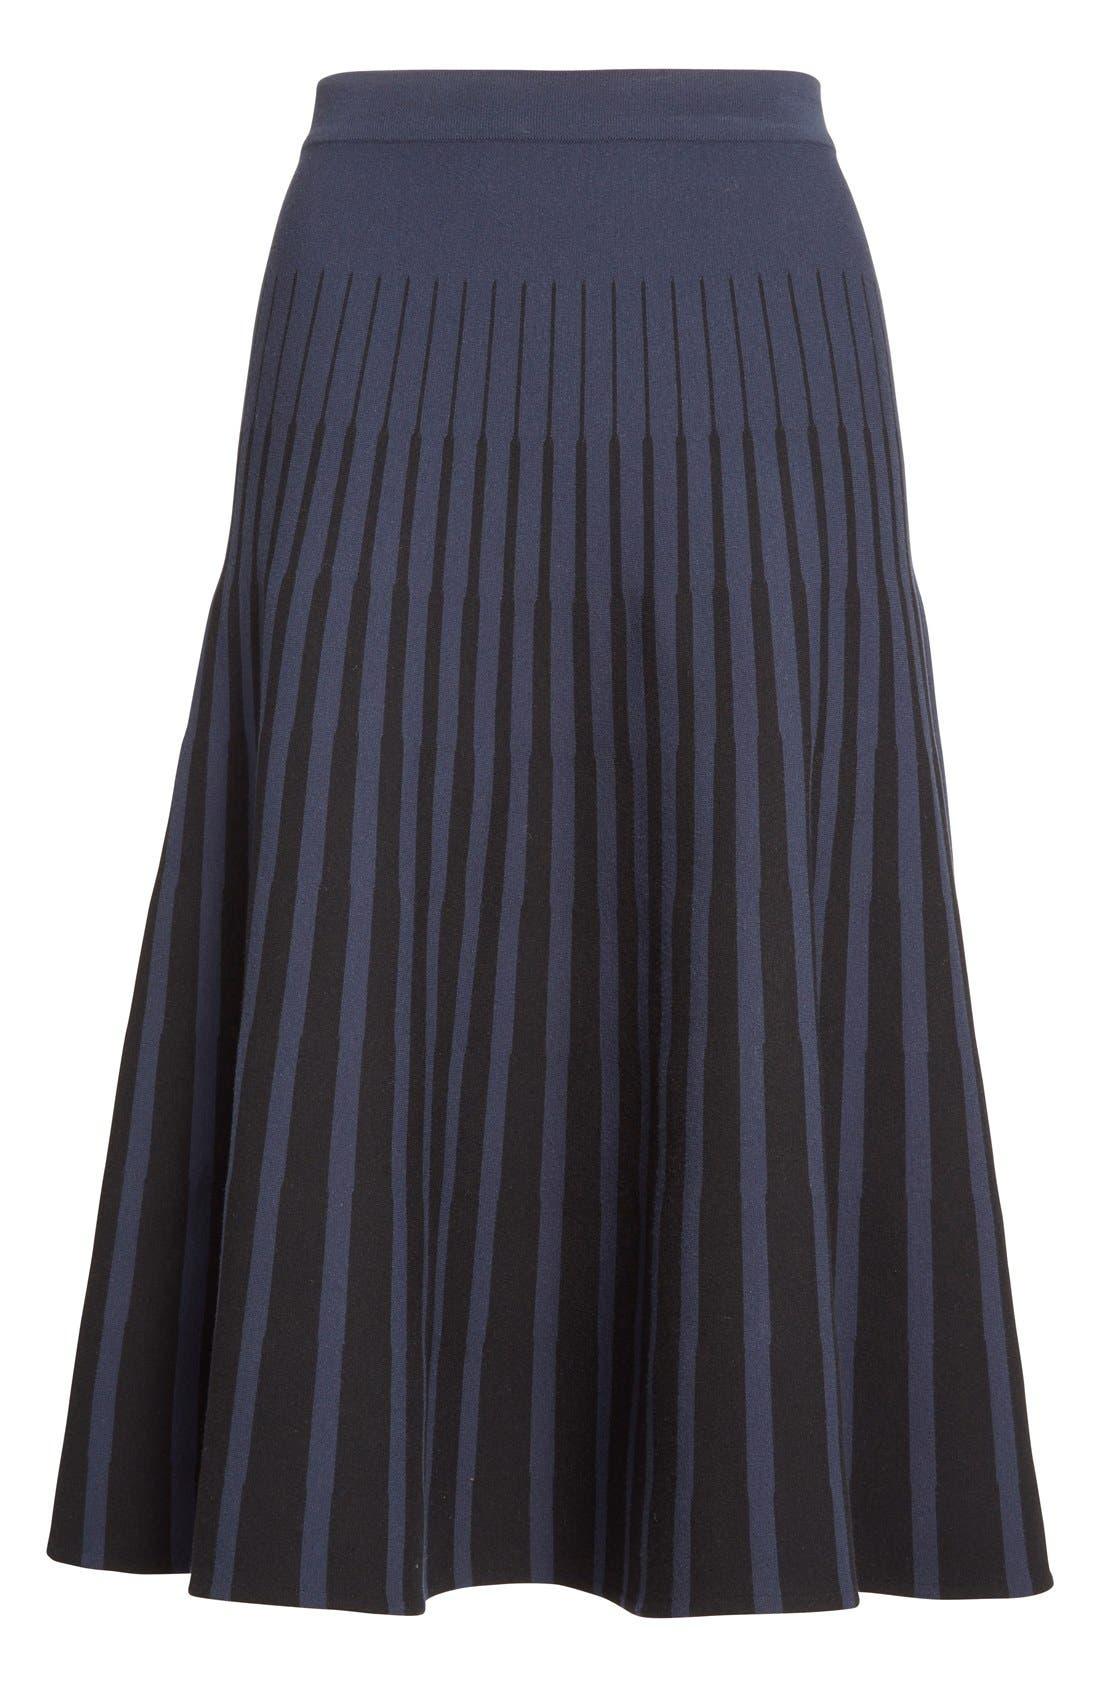 Alternate Image 4  - Tomas Maier Stripe Knit Flared Skirt